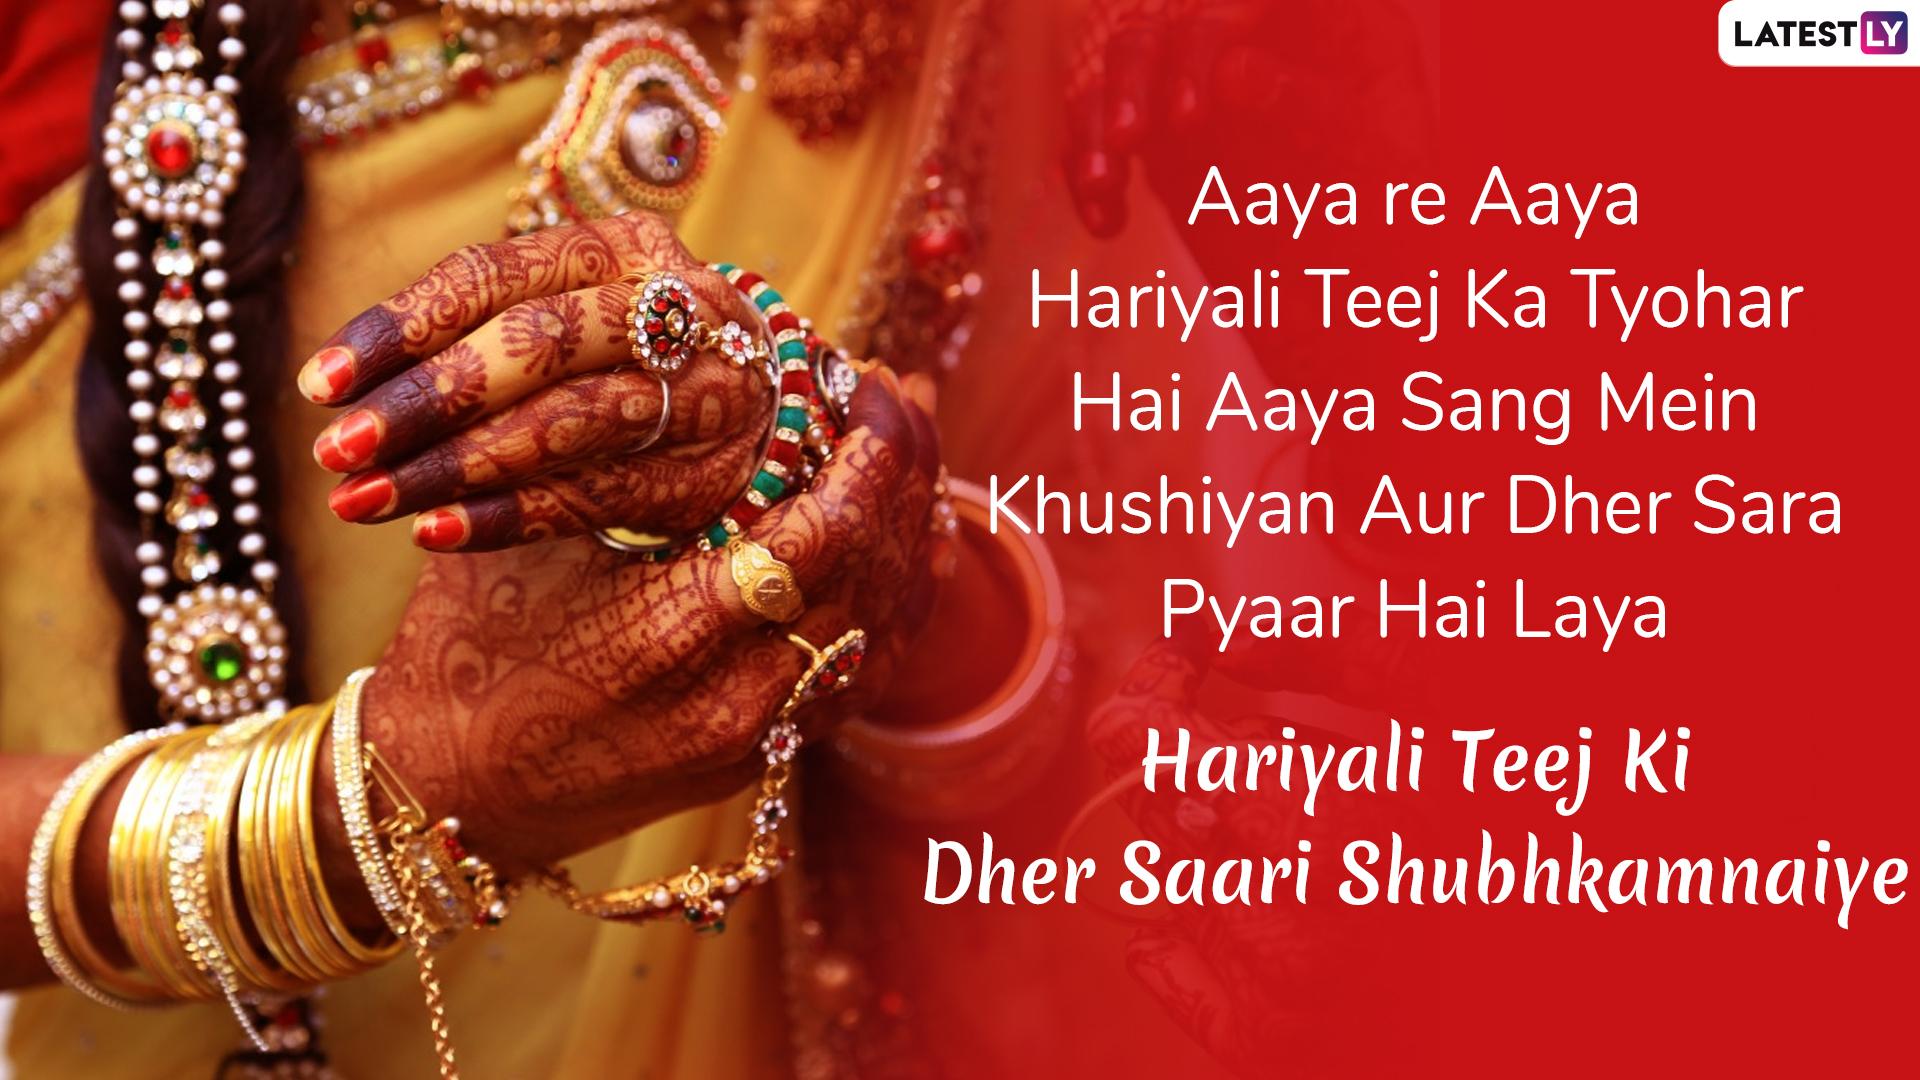 Hariyali Teej 2019 Messages And Wishes In Hindi Whatsapp